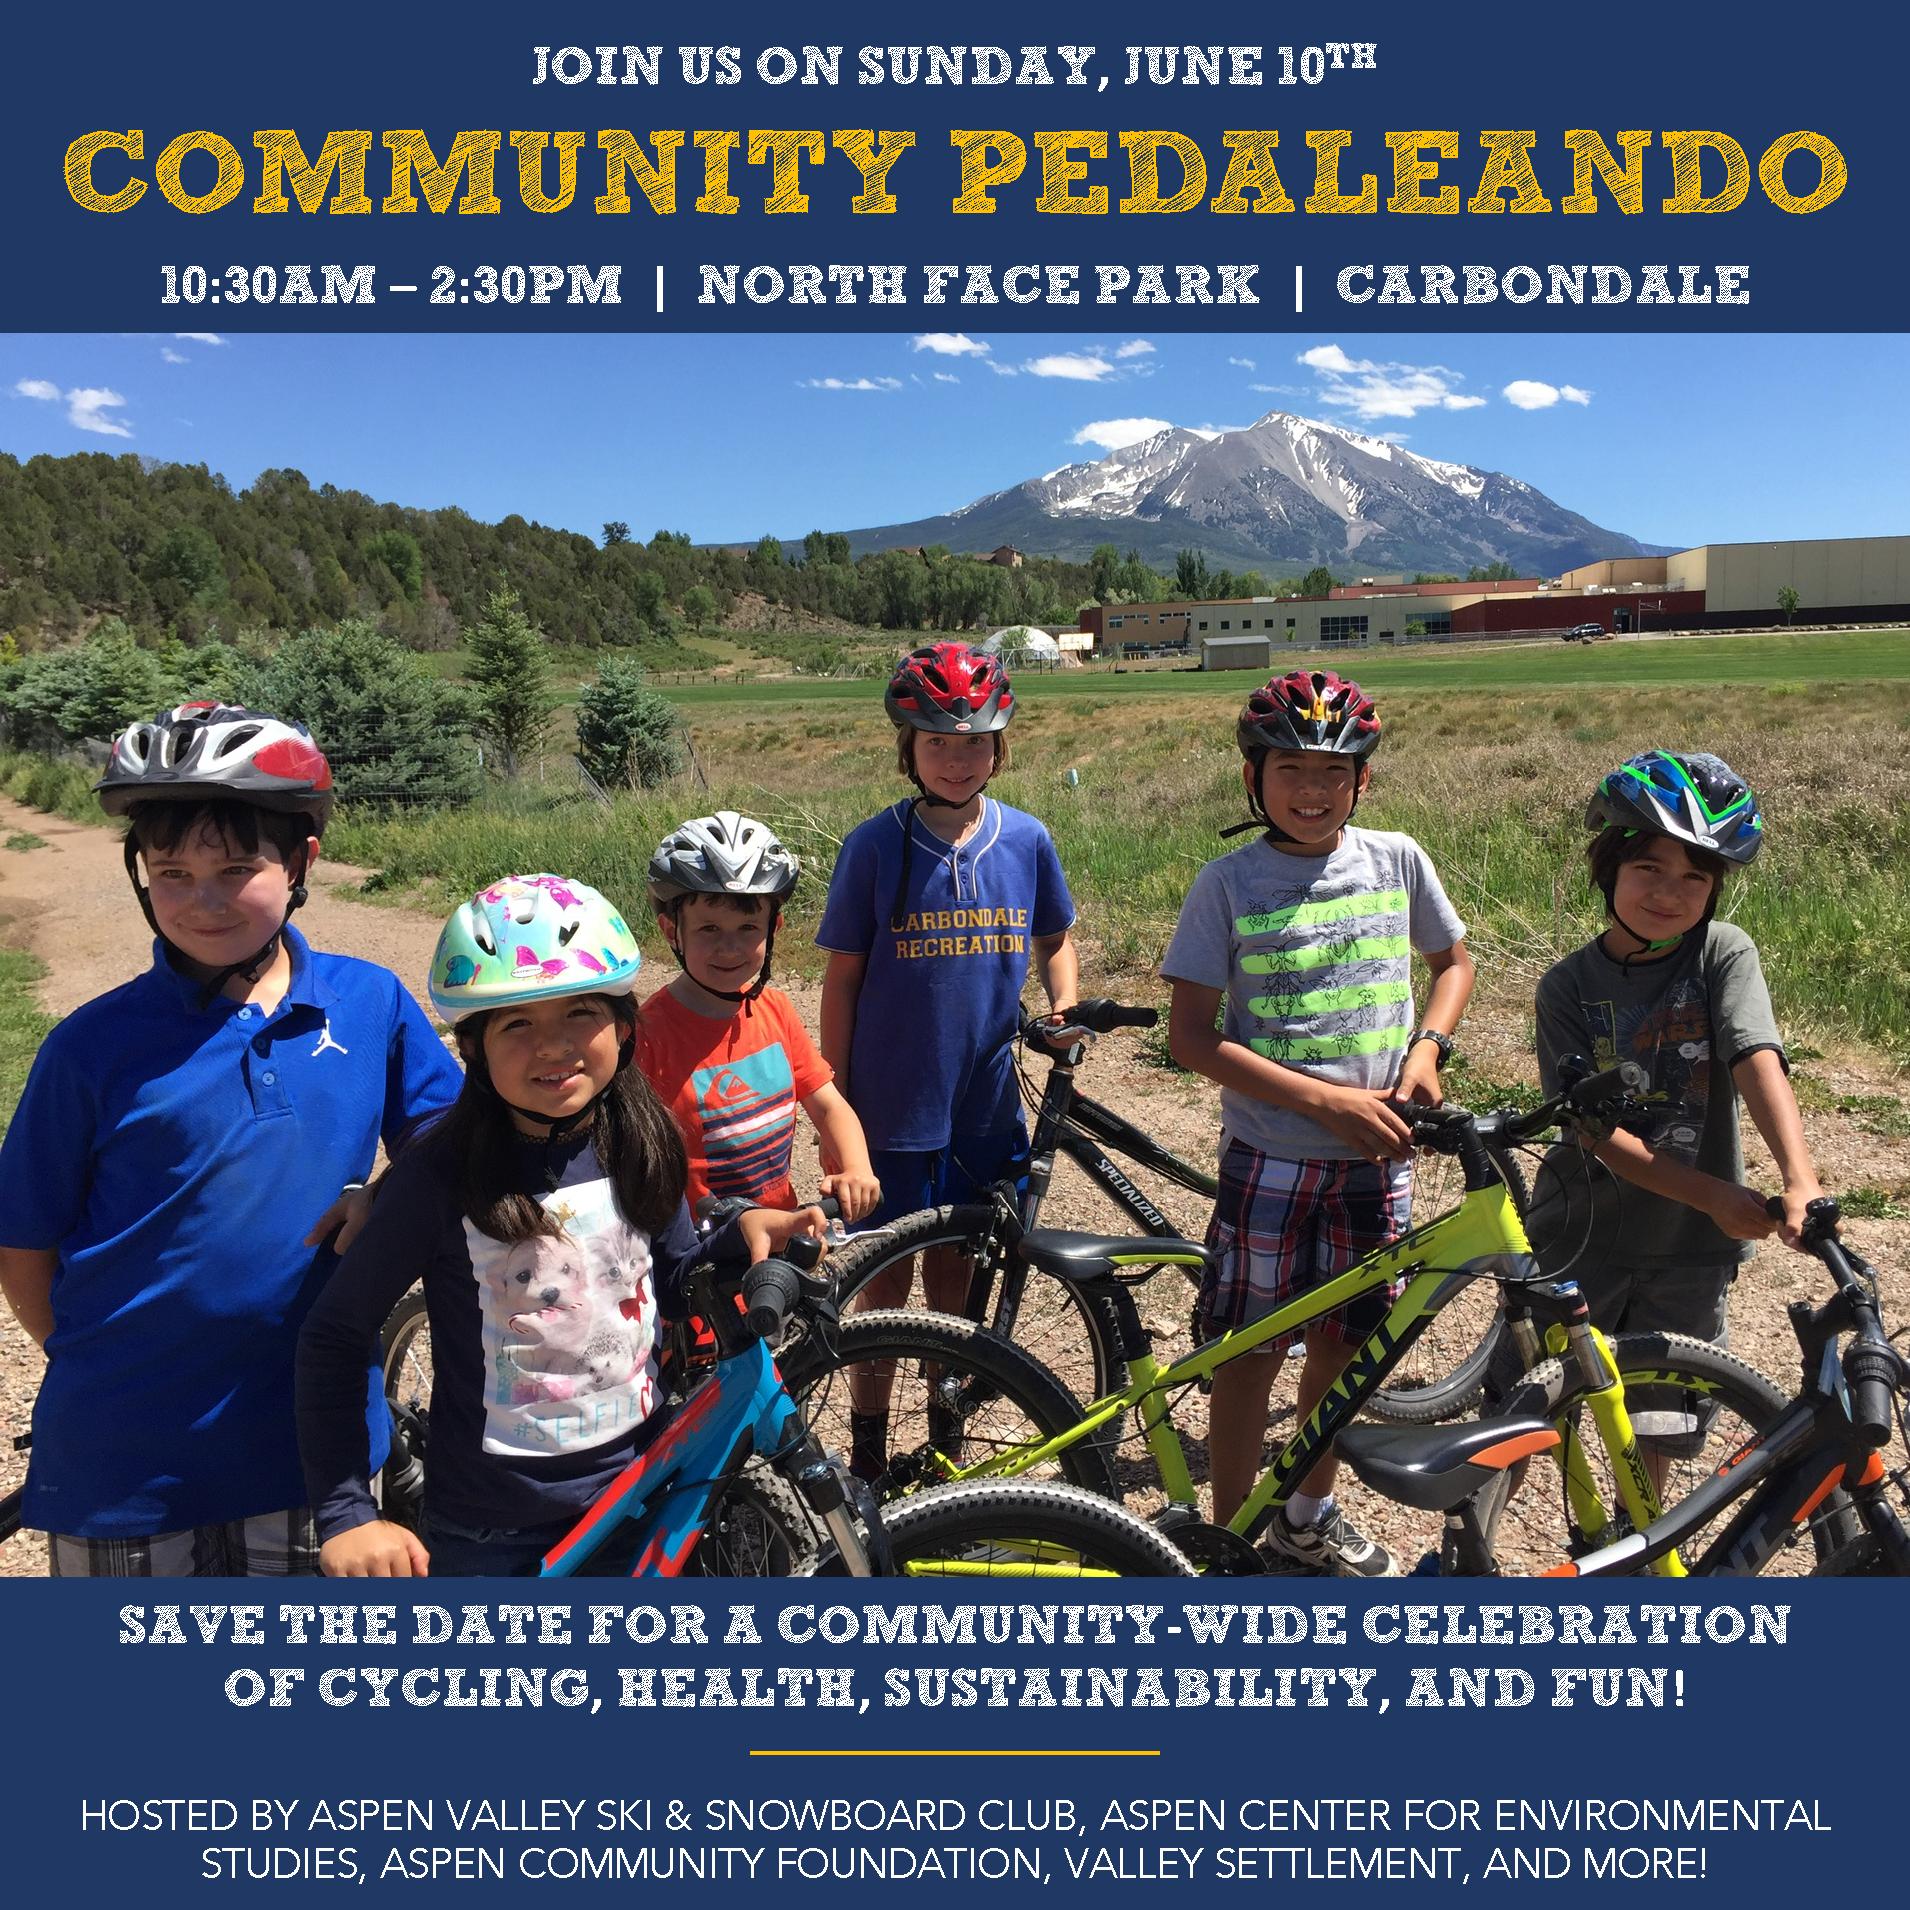 Community Pedaleando